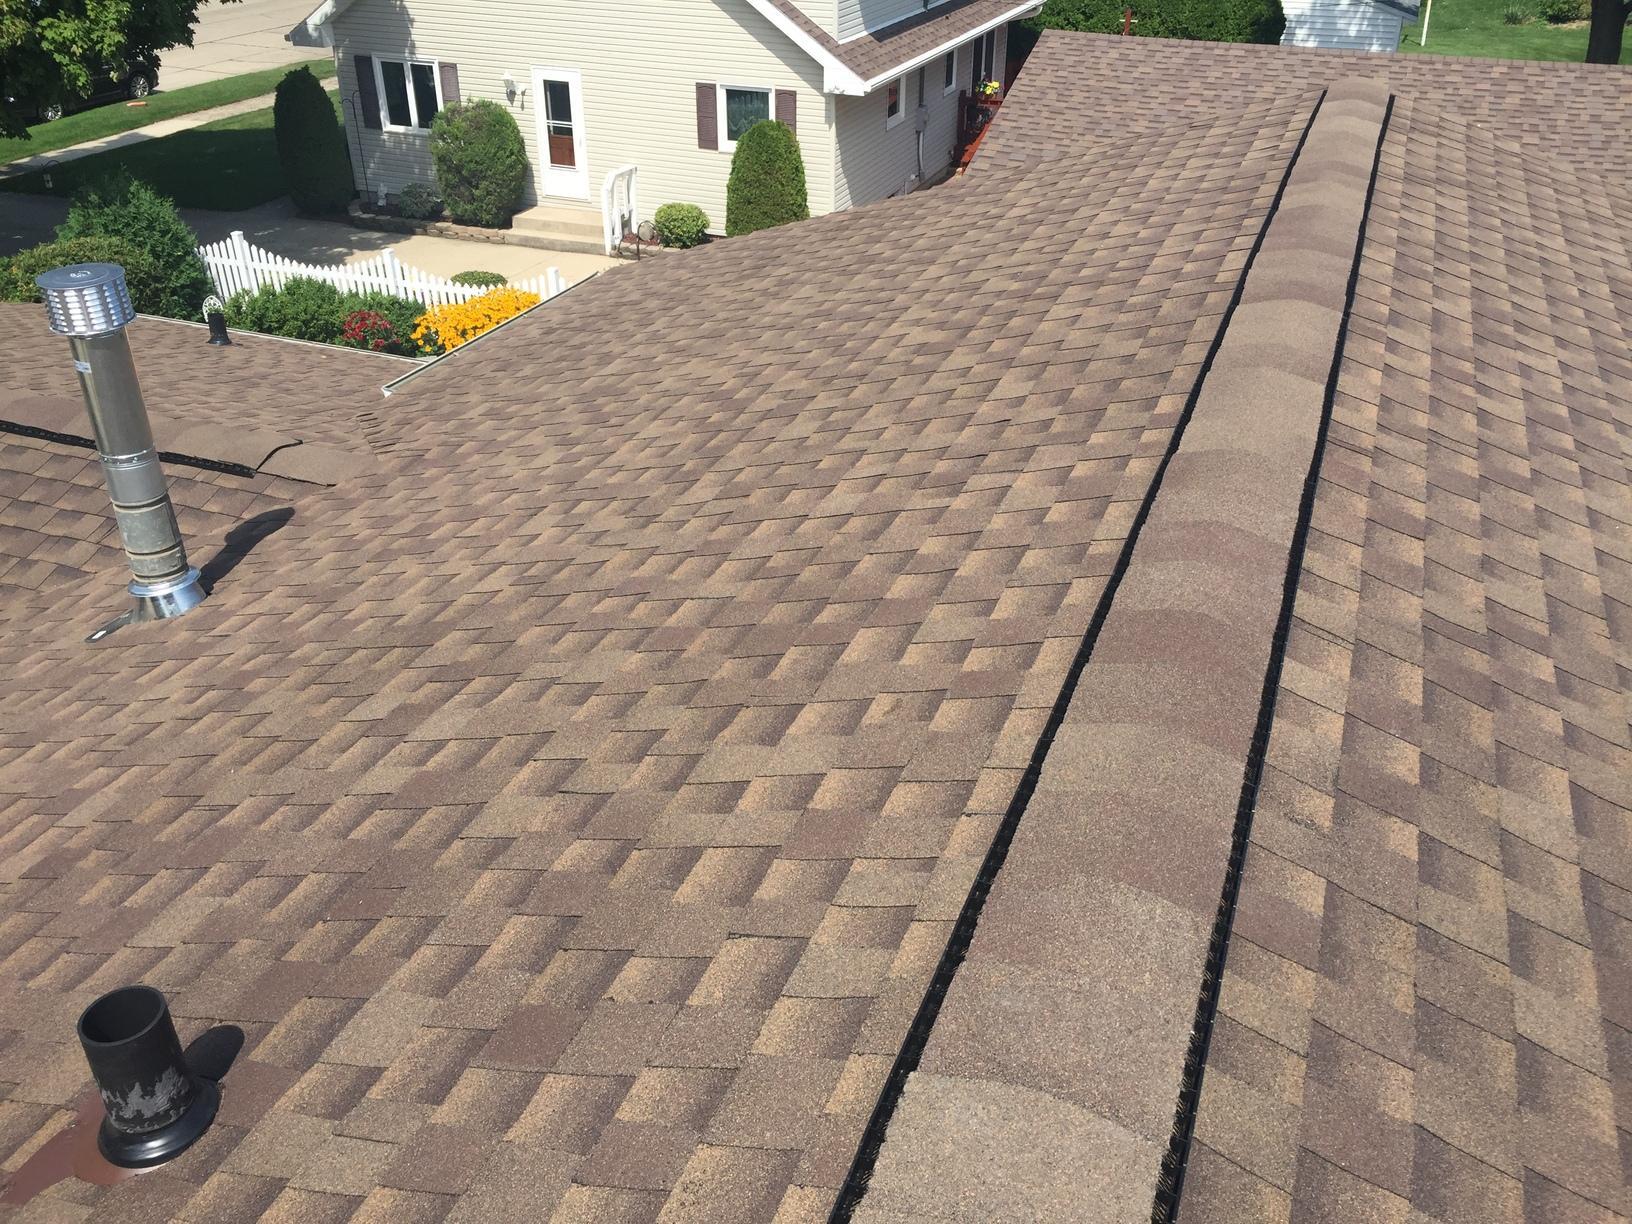 GAF Master Elite Asphalt Shingle Roof on Home in Kimberly, WI - After Photo